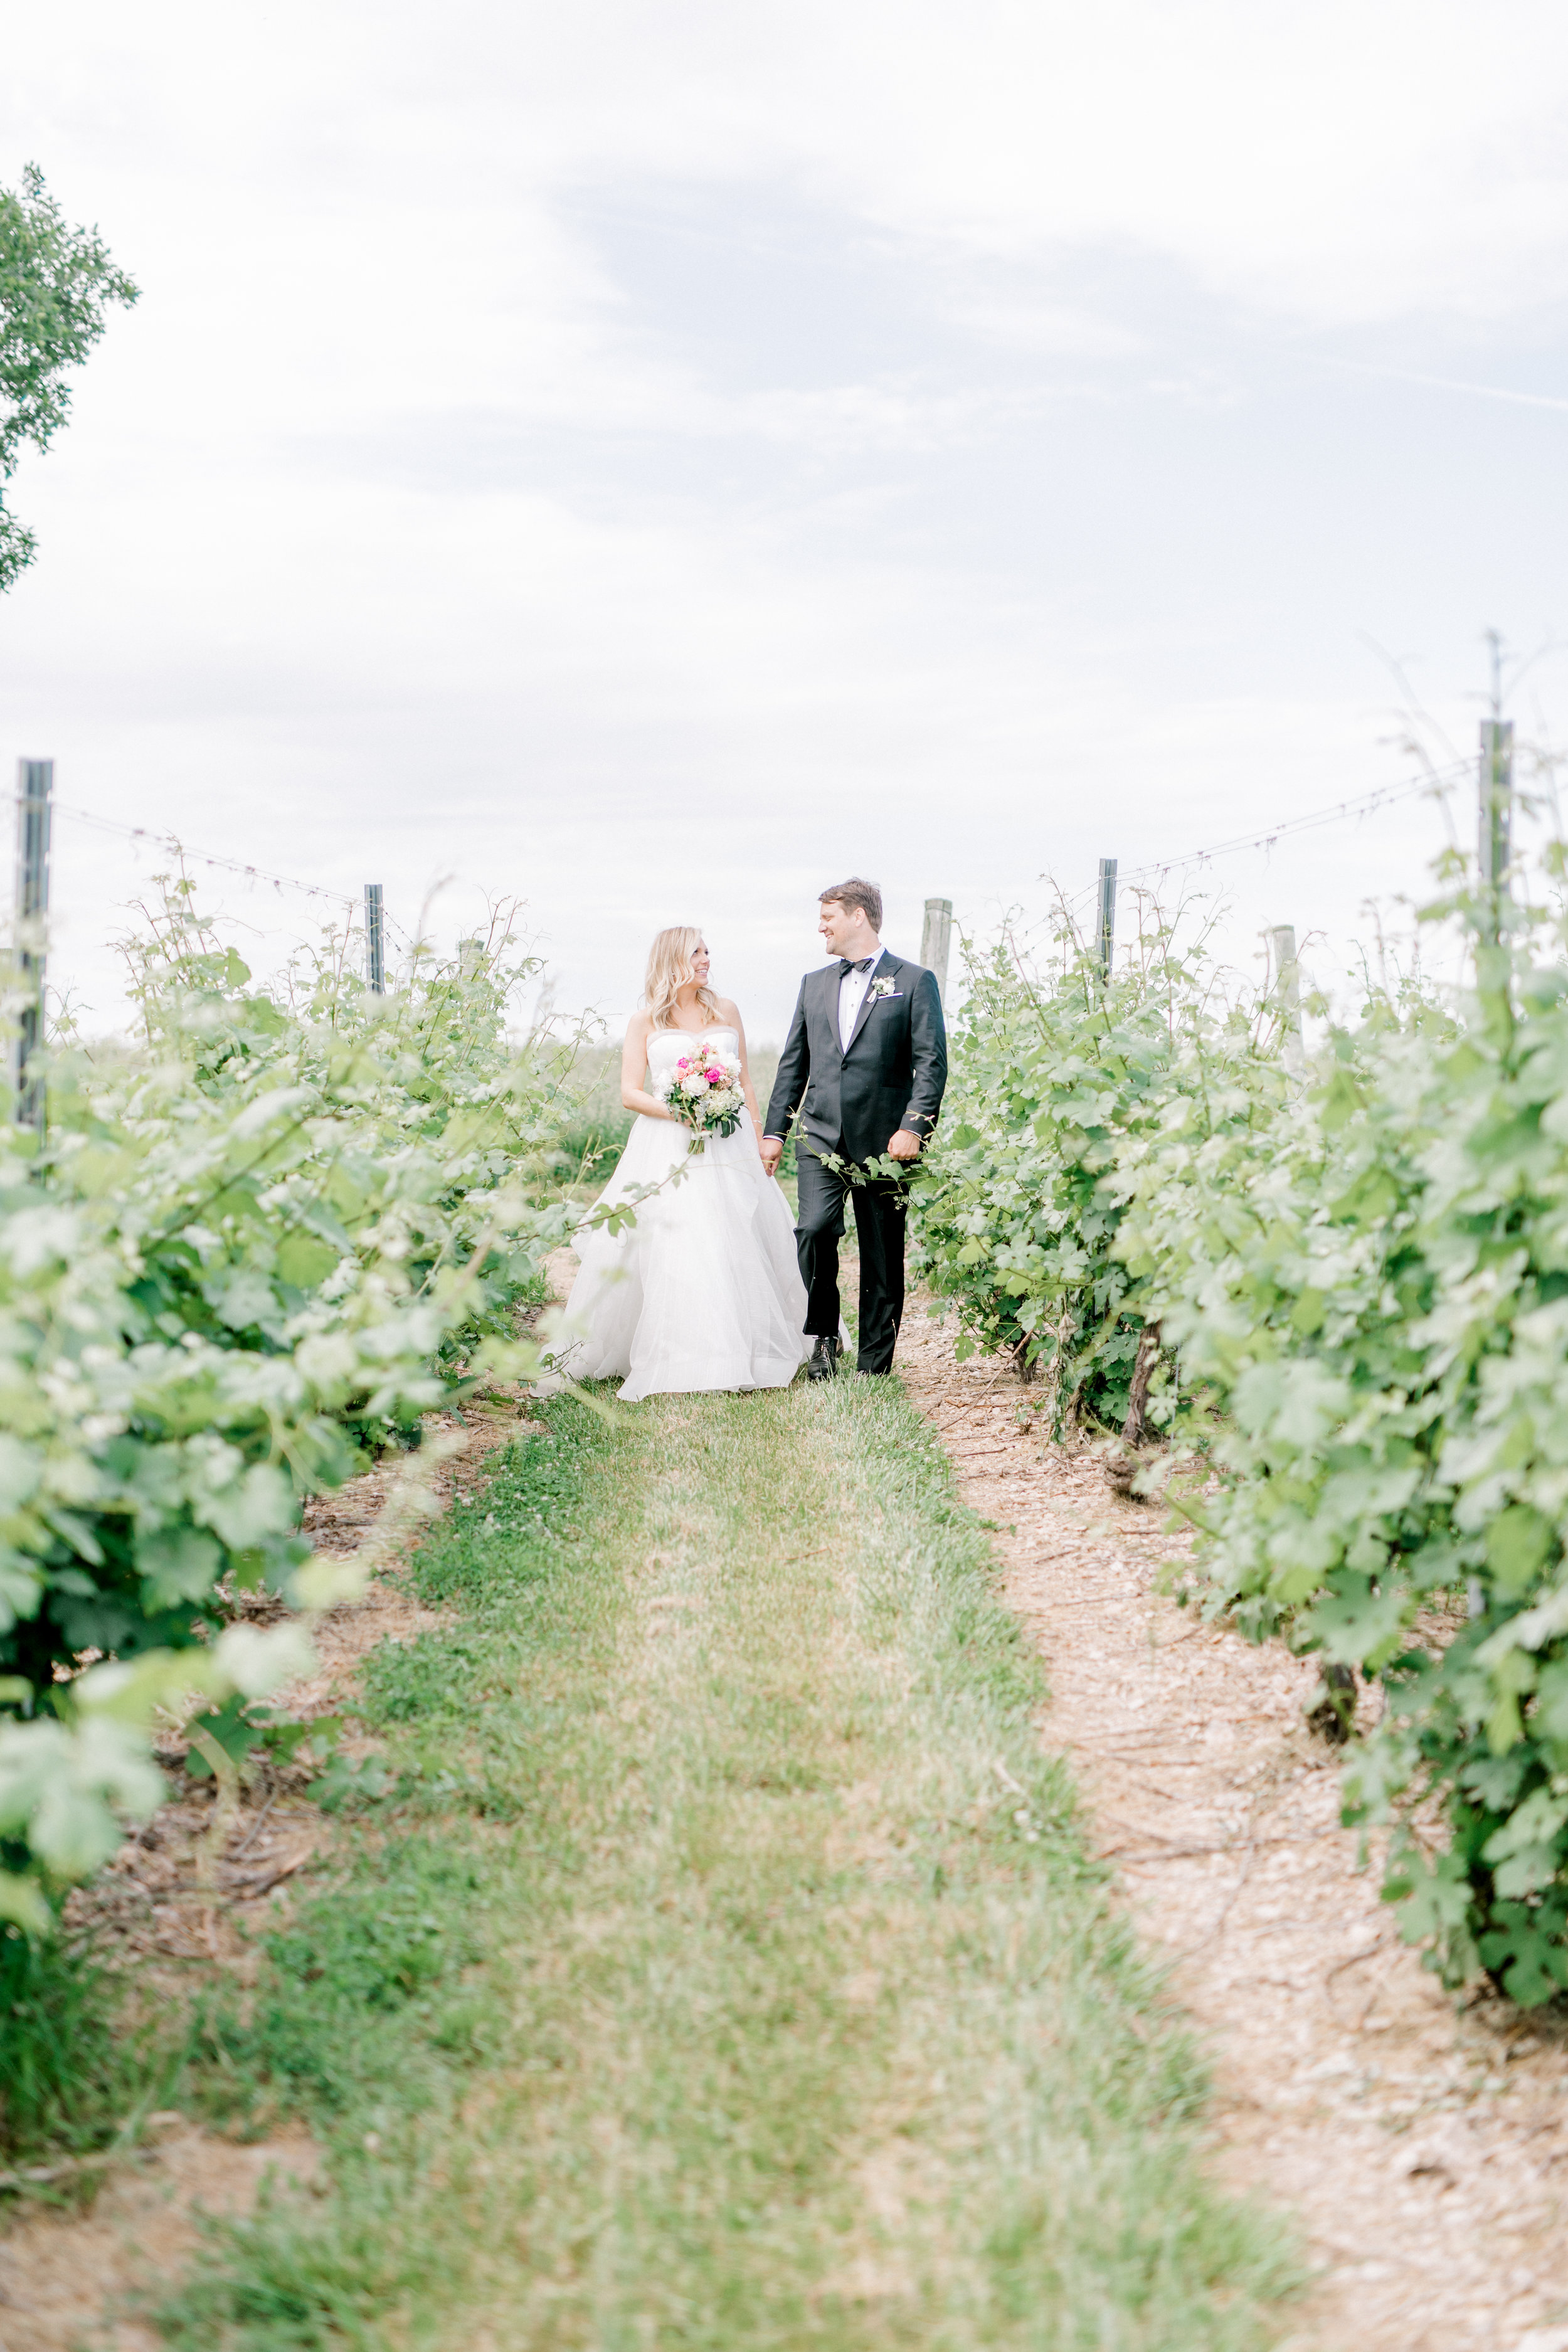 haley-richter-photography-fero-vineyards-summer-wedding-allison-and-josh-winery-pennsylvania-170.jpg